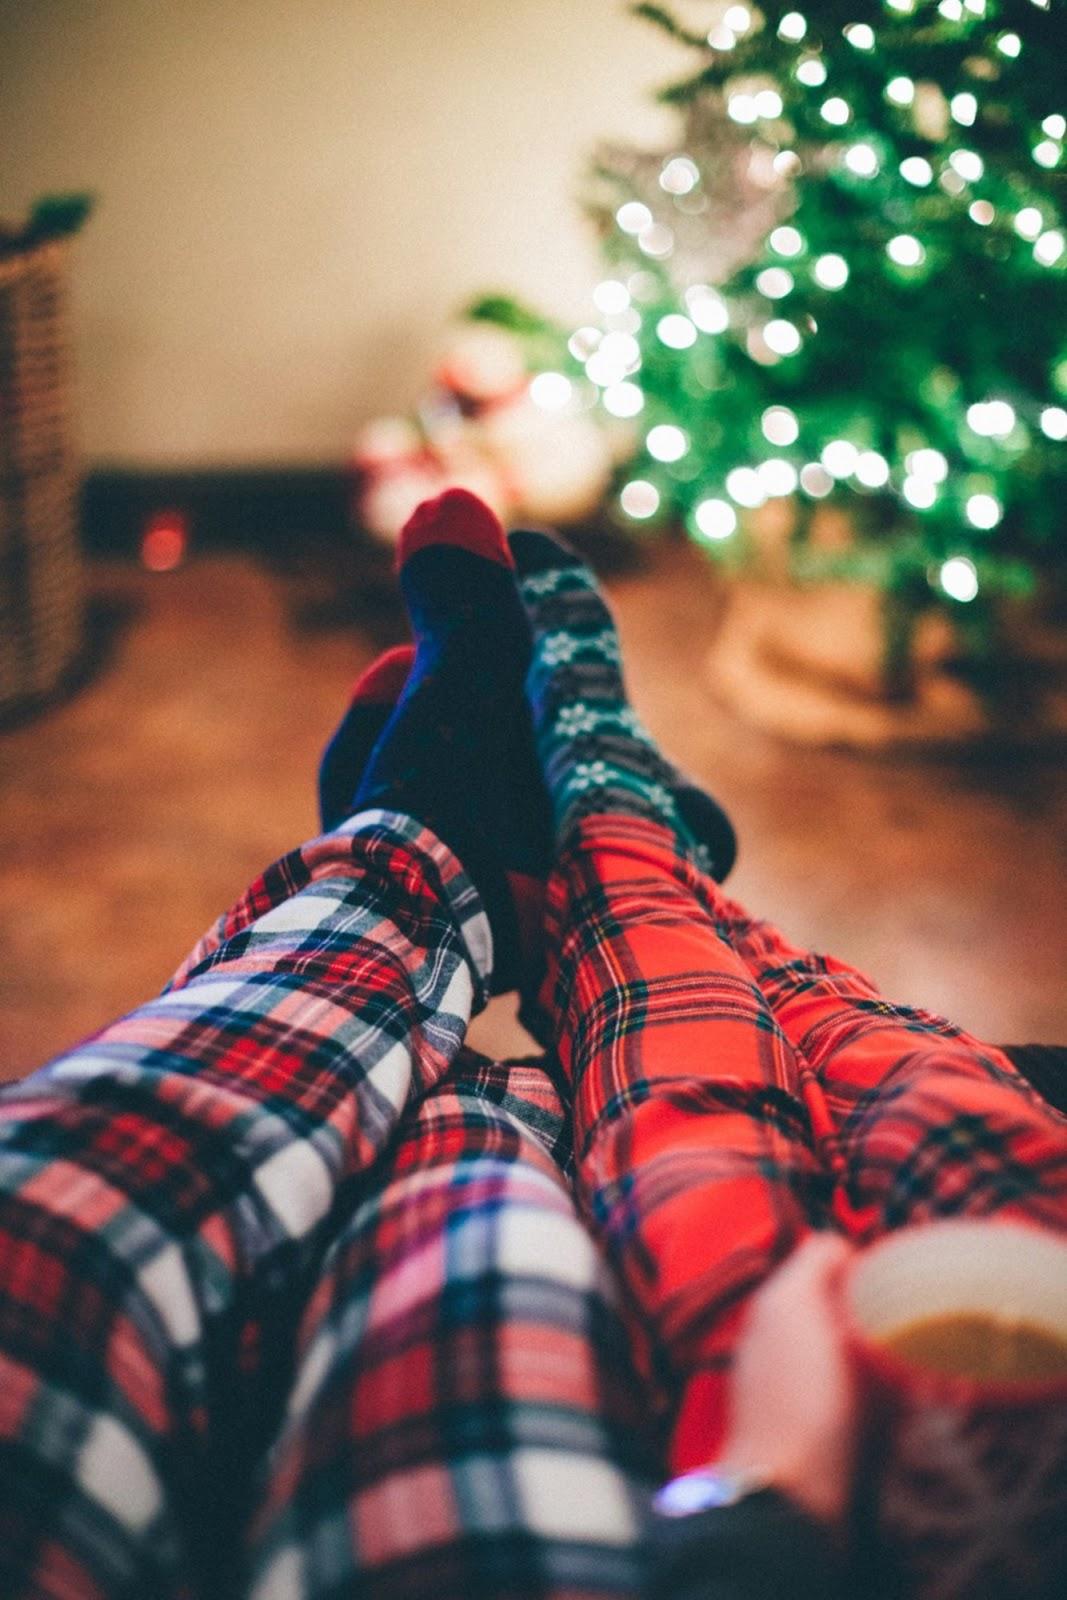 plaid pajamas for cozy winter evening